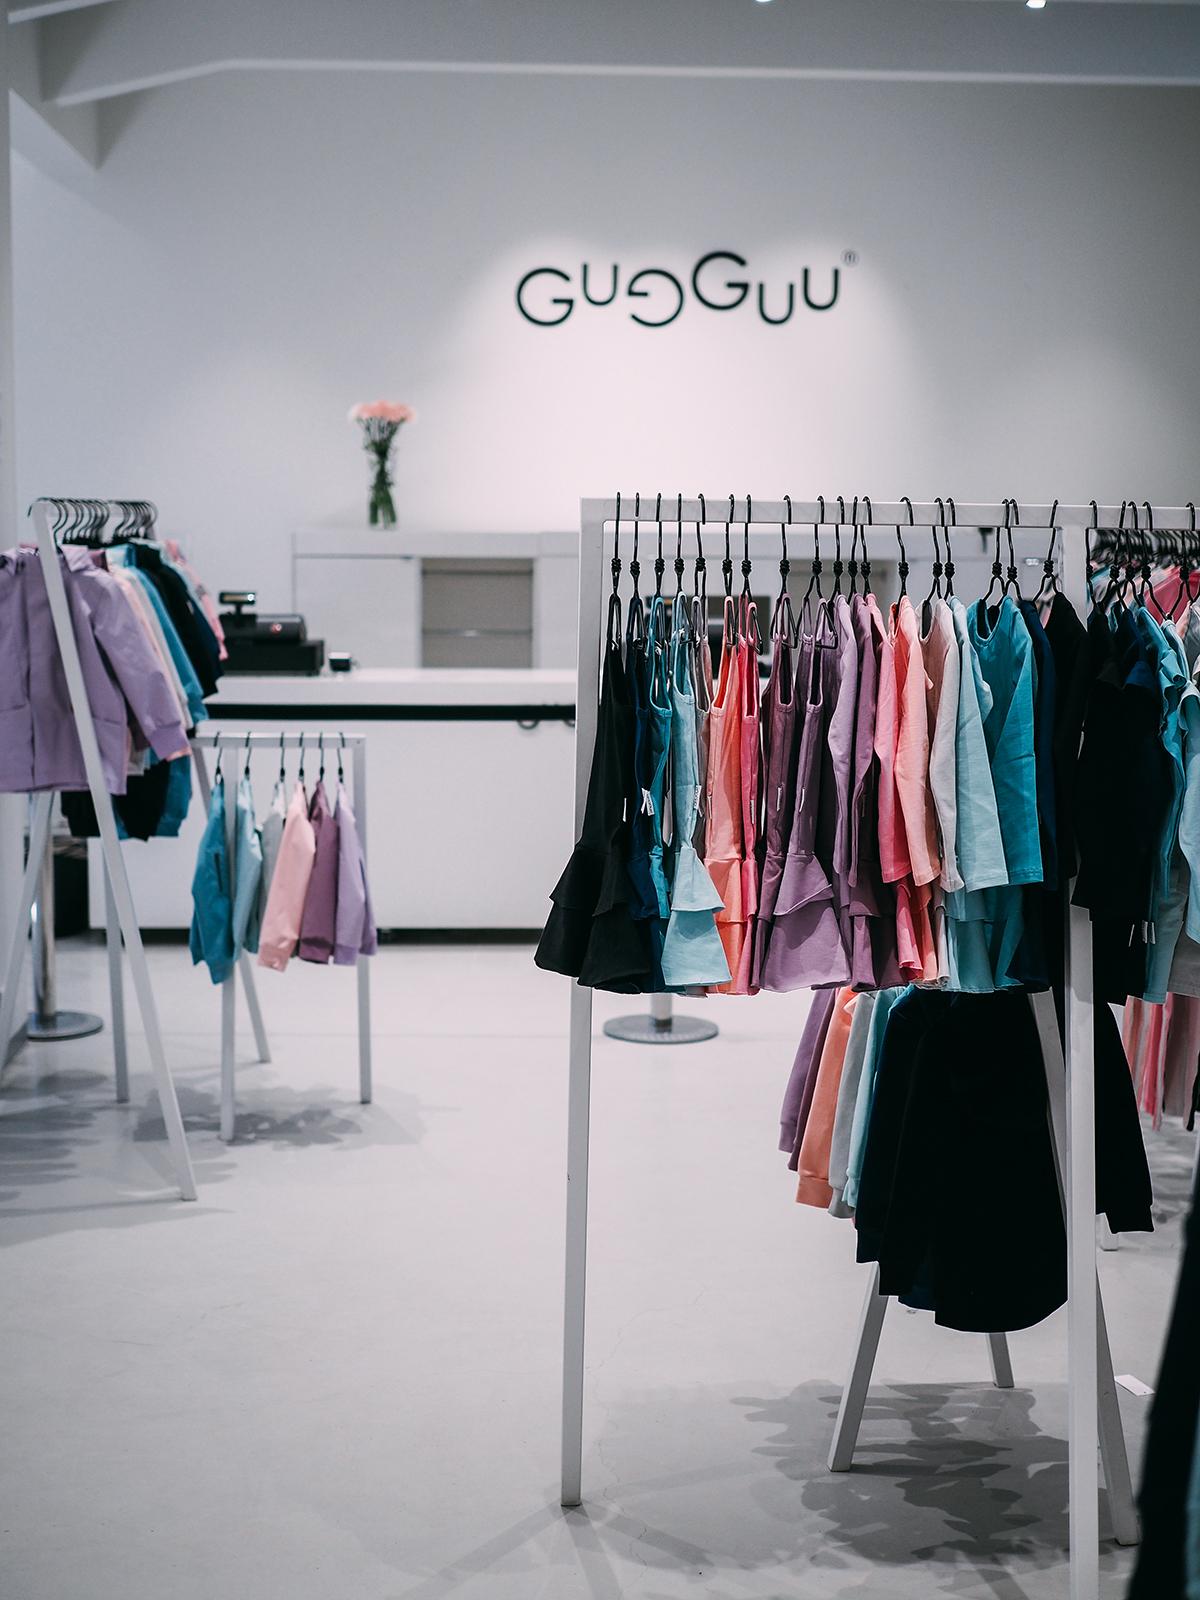 Gugguu pop-up shop